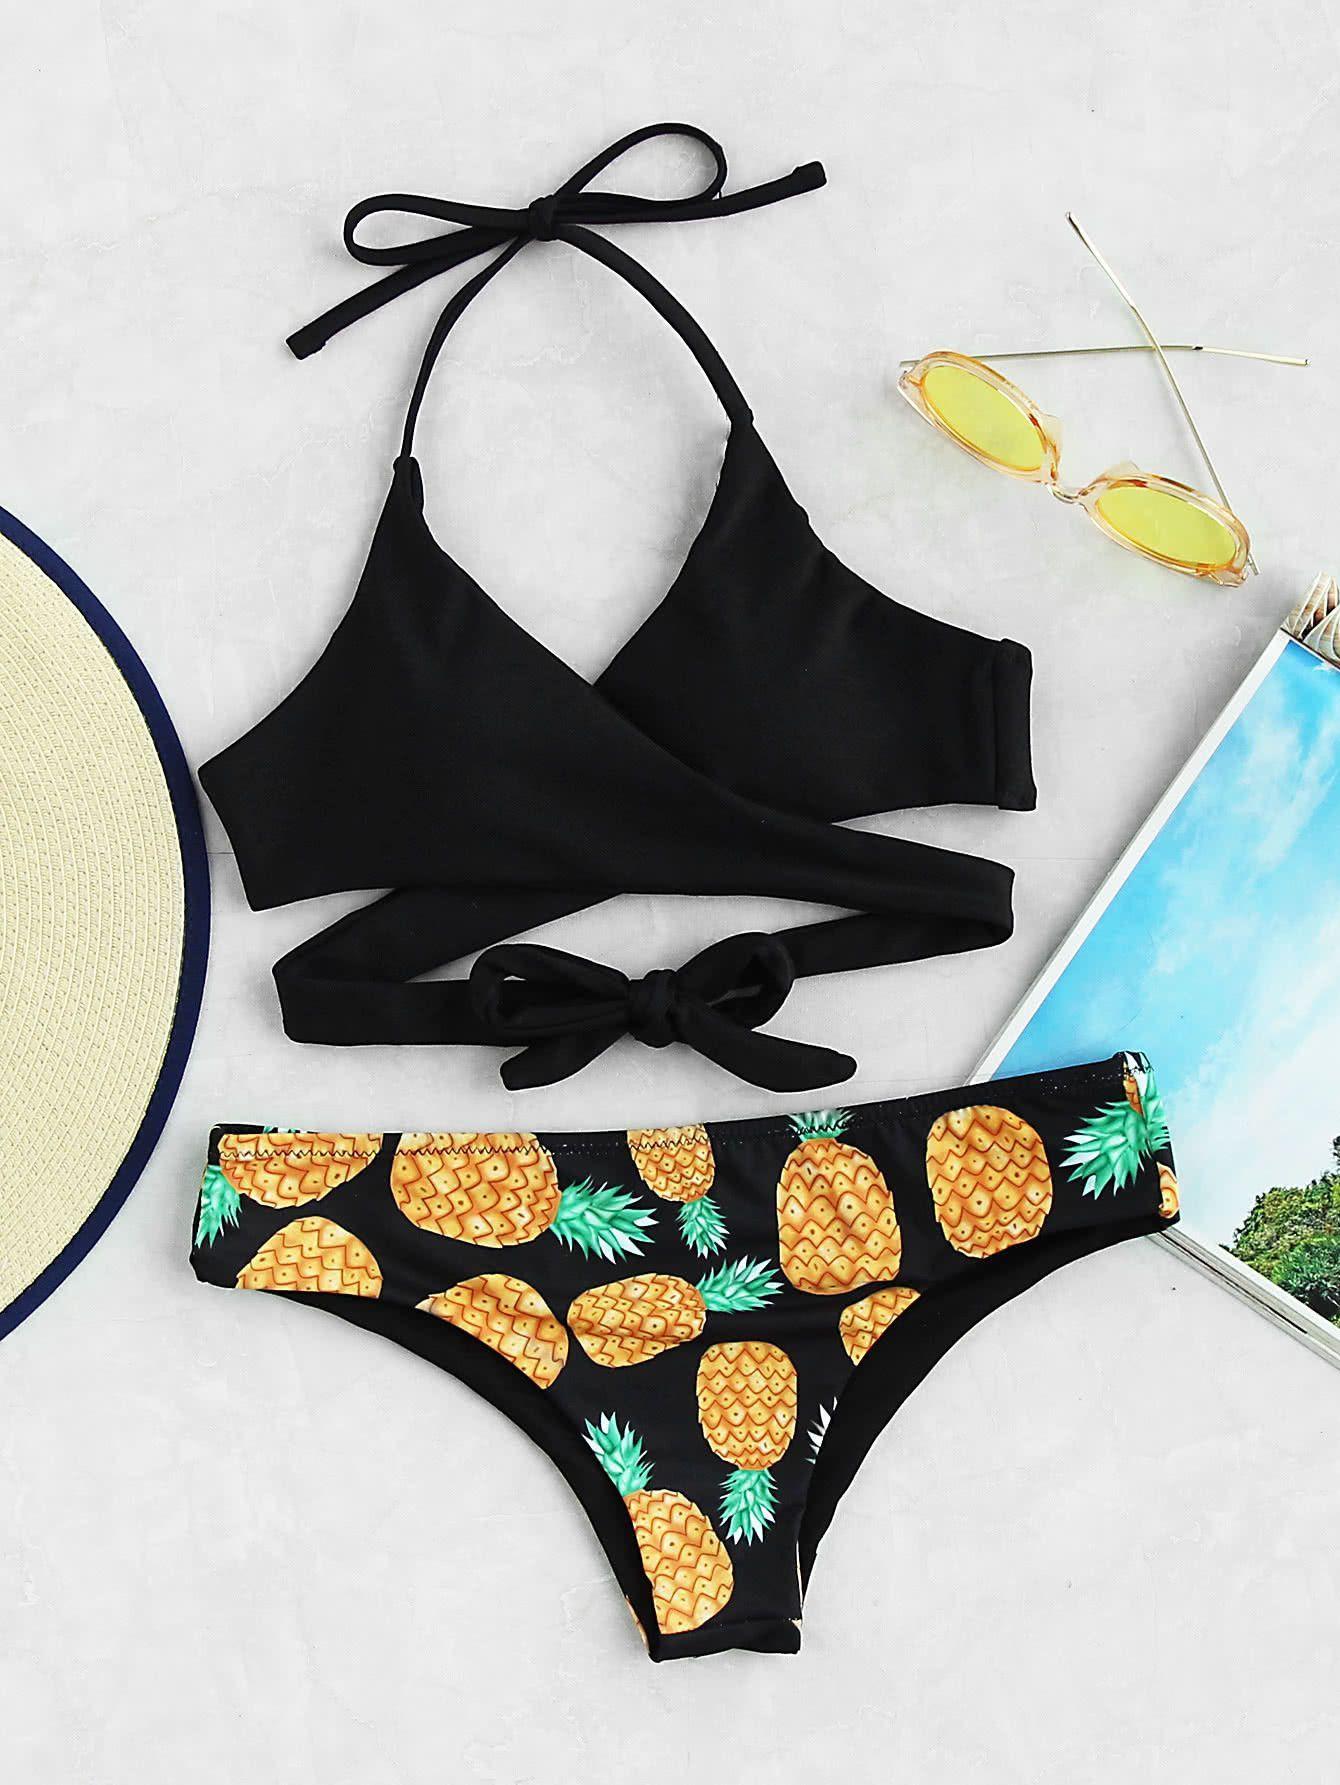 0aec017032b Cami Palm Leaf Print Bikini in 2019 | ZAFUL CLOTHING | Zaful bikinis,  Summer bathing suits, Summer bikinis